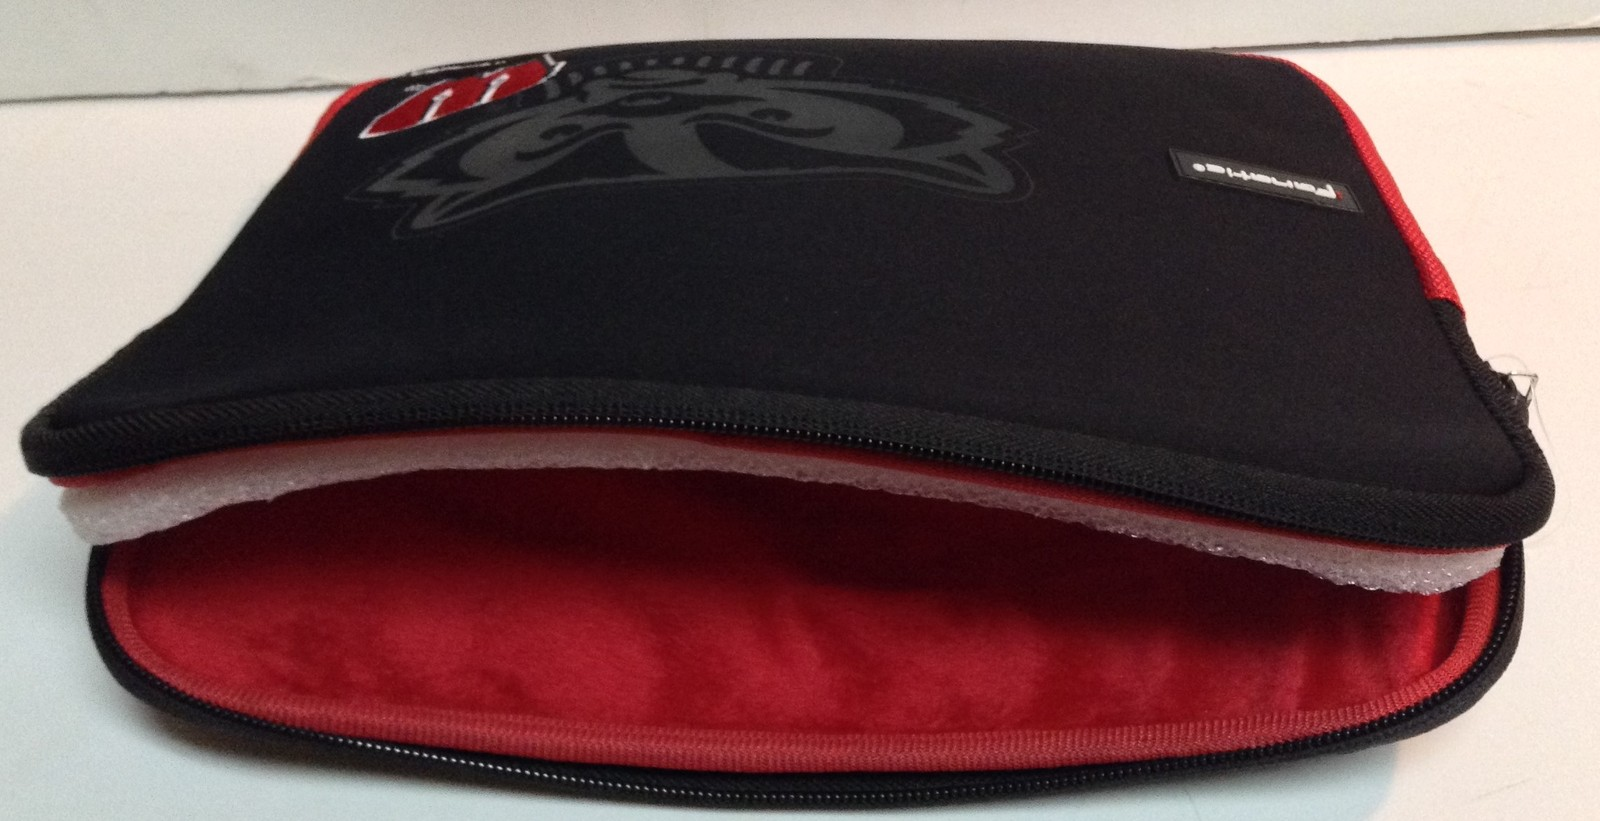 Wisconsin University Bucky Badger Ipad Laptop Protection Case